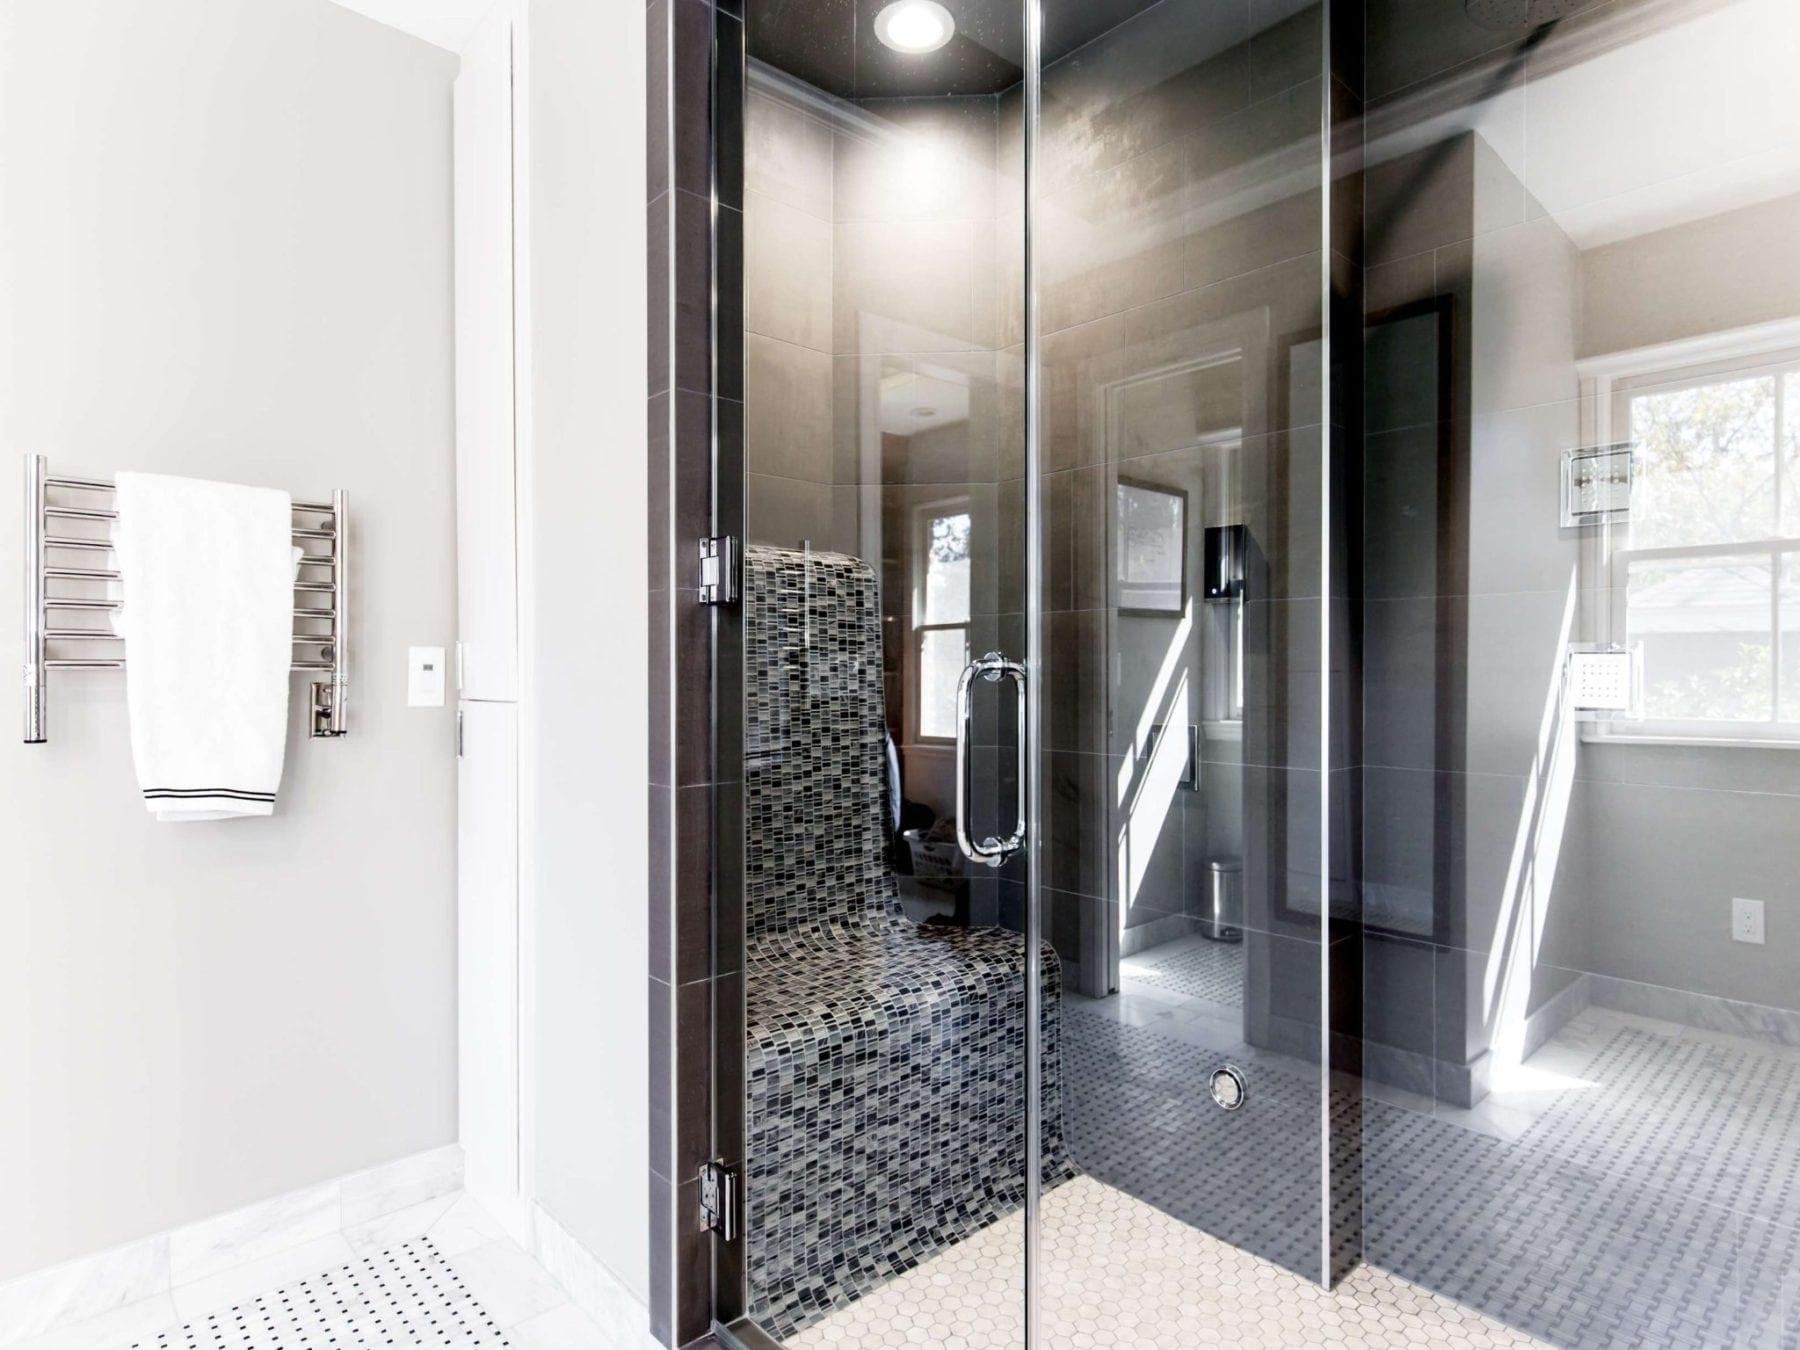 Personal Shower Spa System in Master Bathroom: Dallas,TX 75206